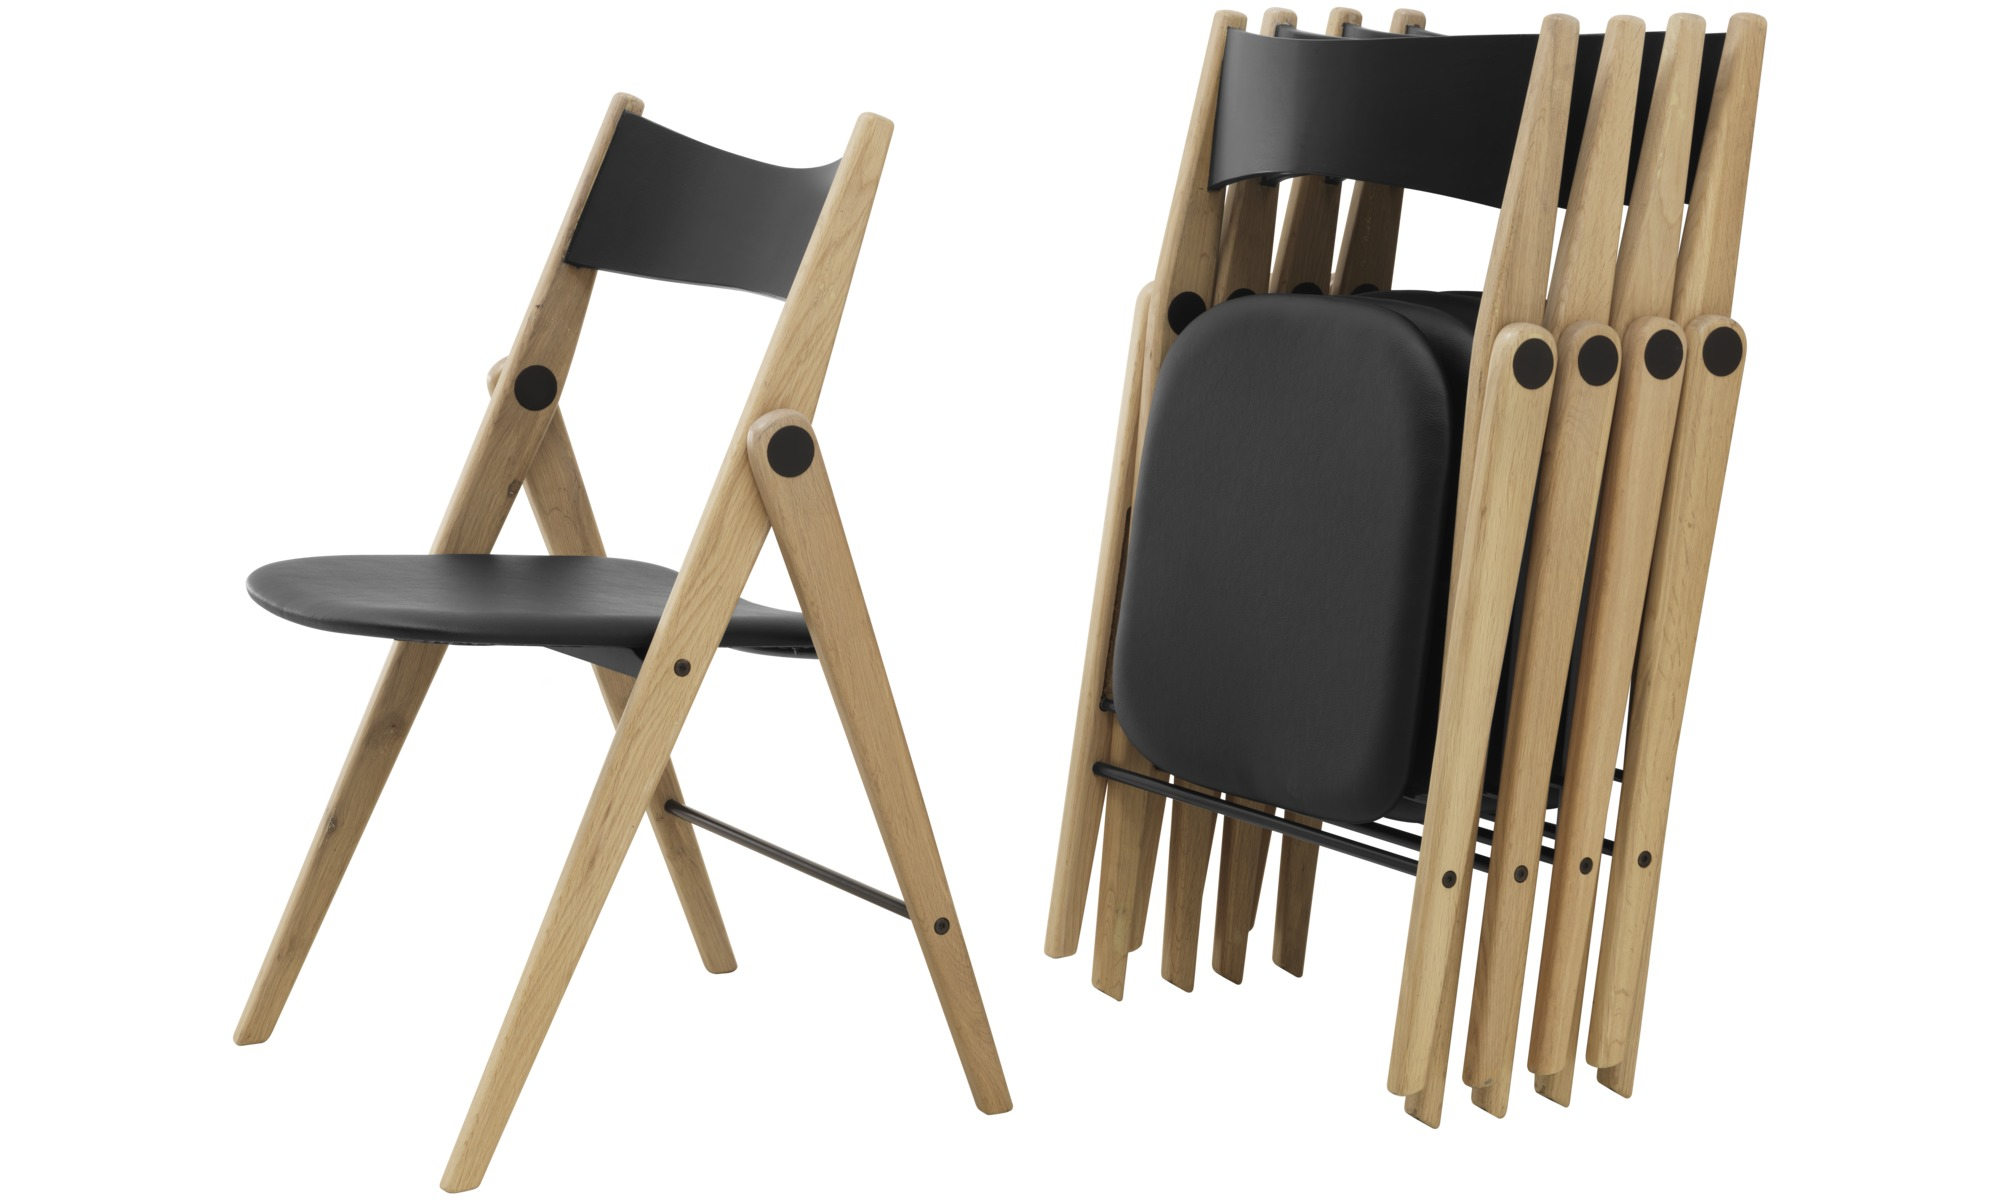 Klappstuhl design  Esszimmerstühle - Oslo Klappstuhl - BoConcept